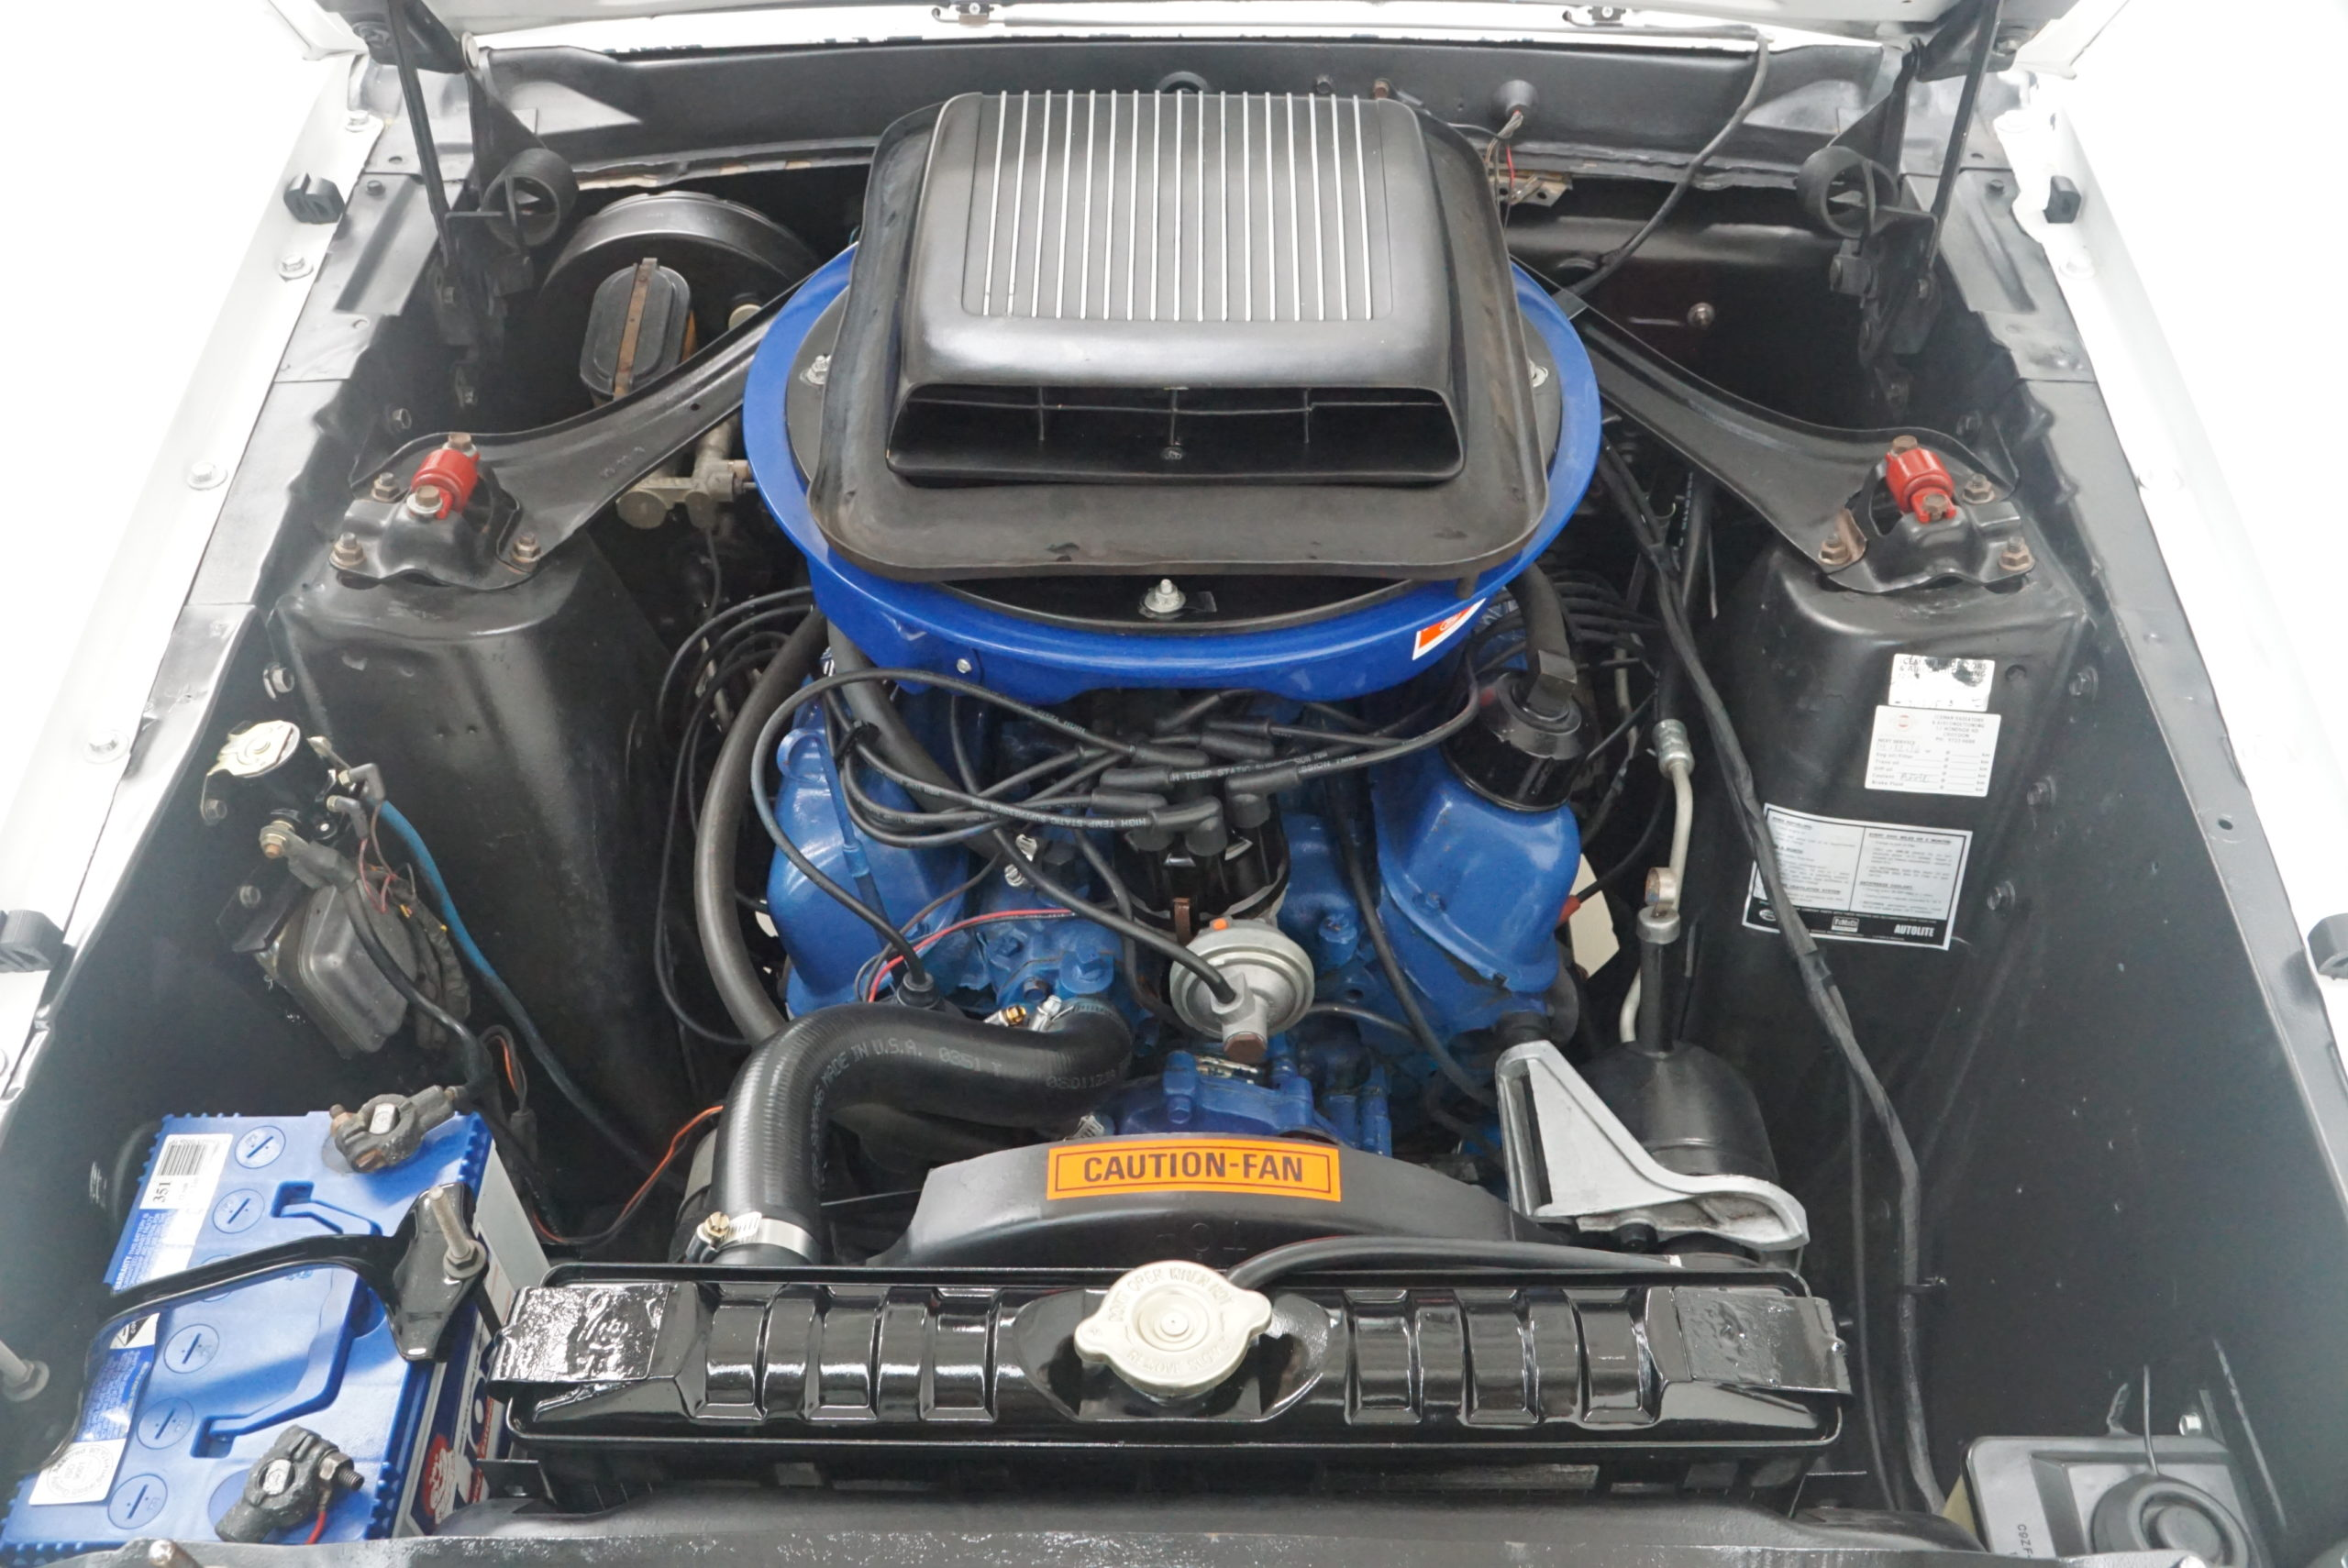 1969 Ford Mustang Boss 302 Tribute Fastback moteur vue de face - Shannons Auctions avril 2021.